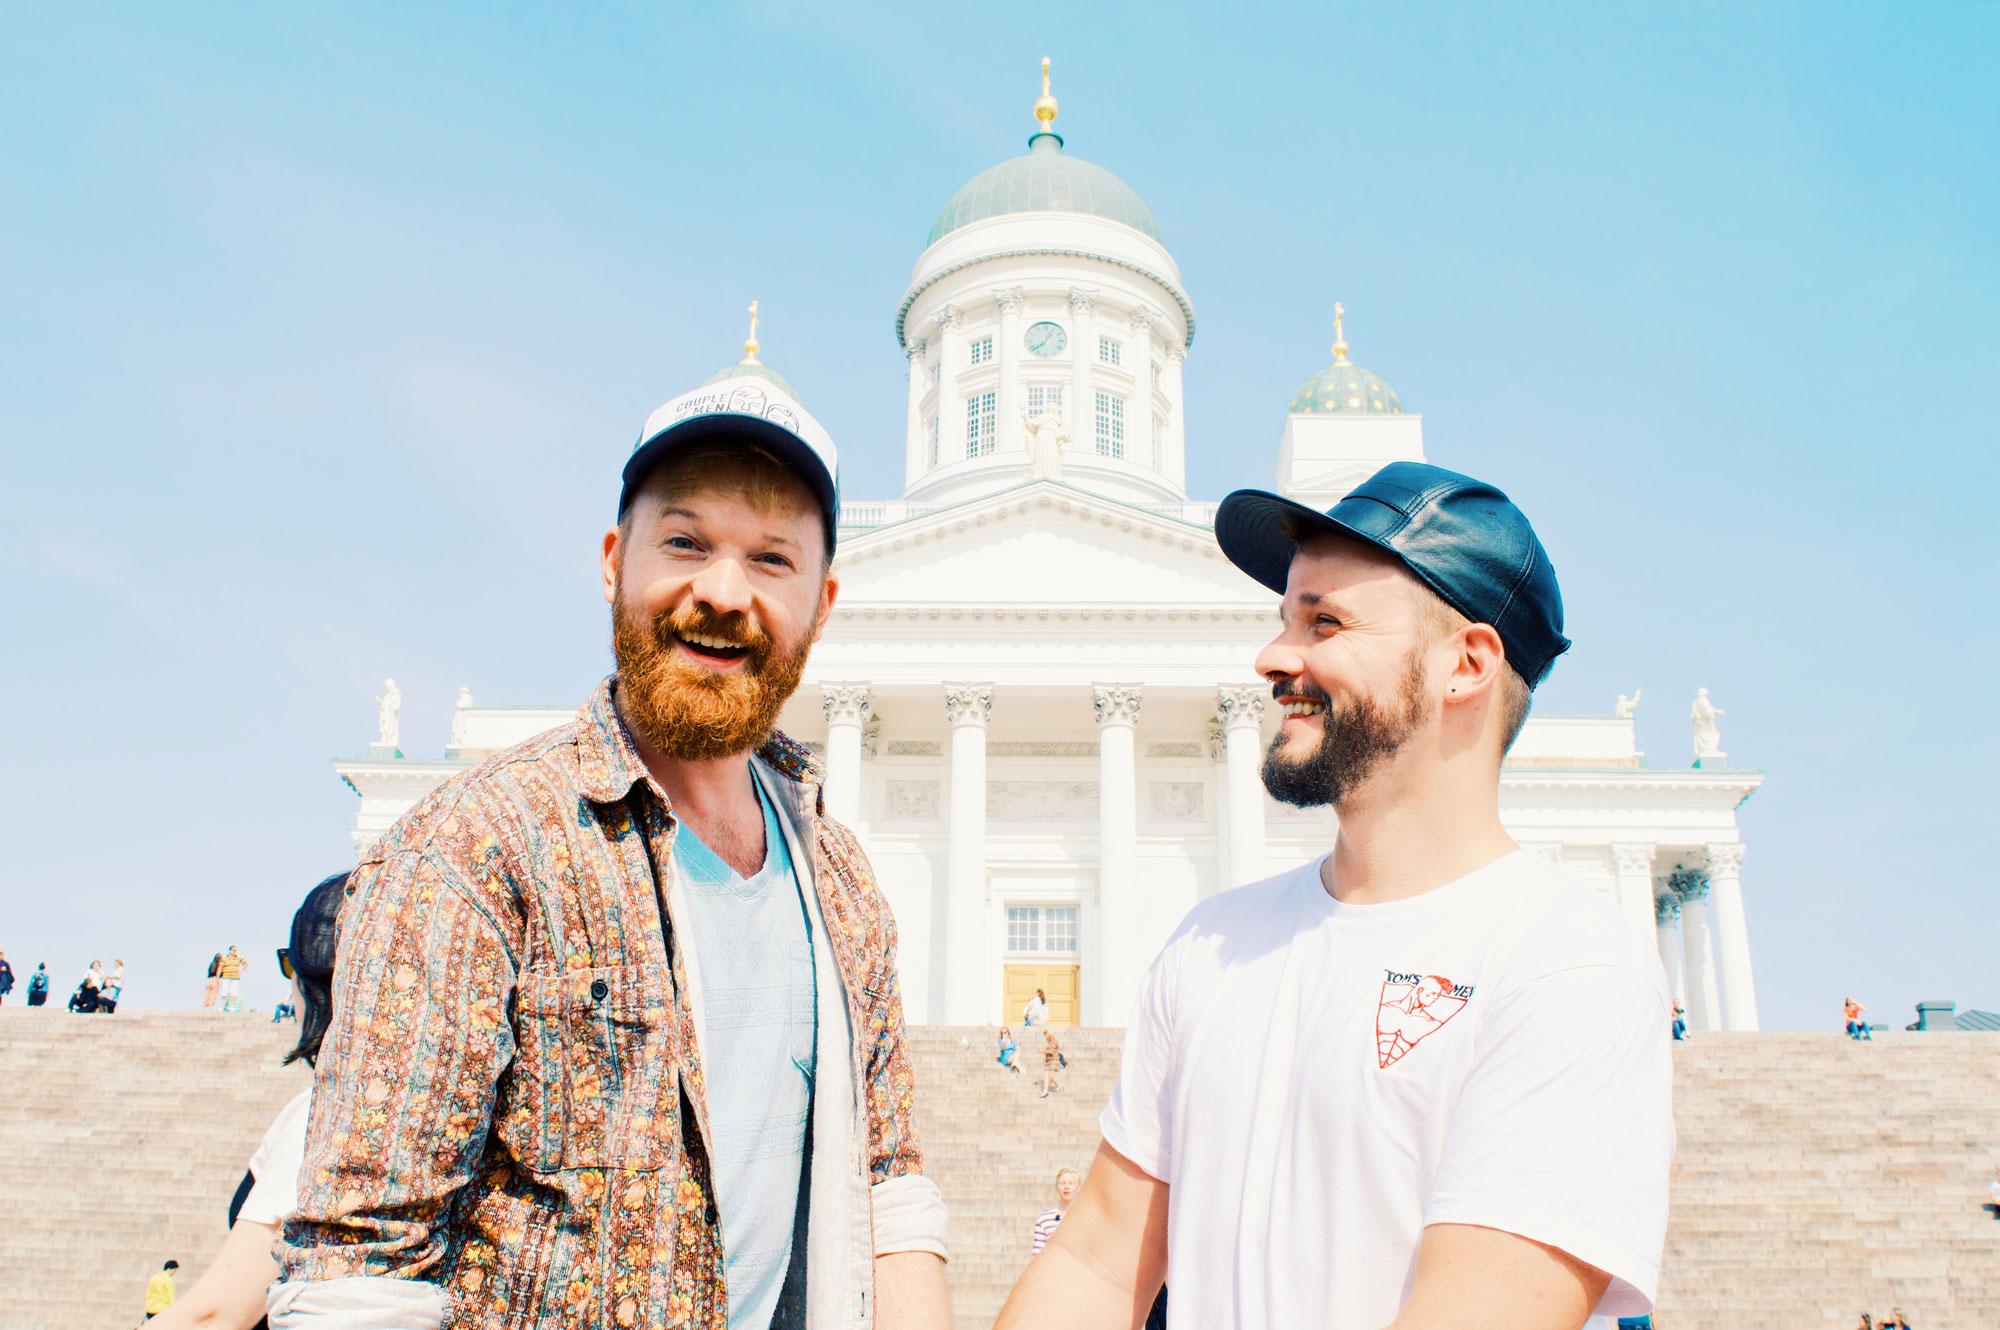 Our Gay Couple City Weekend Helsinki Finnland © CoupleofMen.com